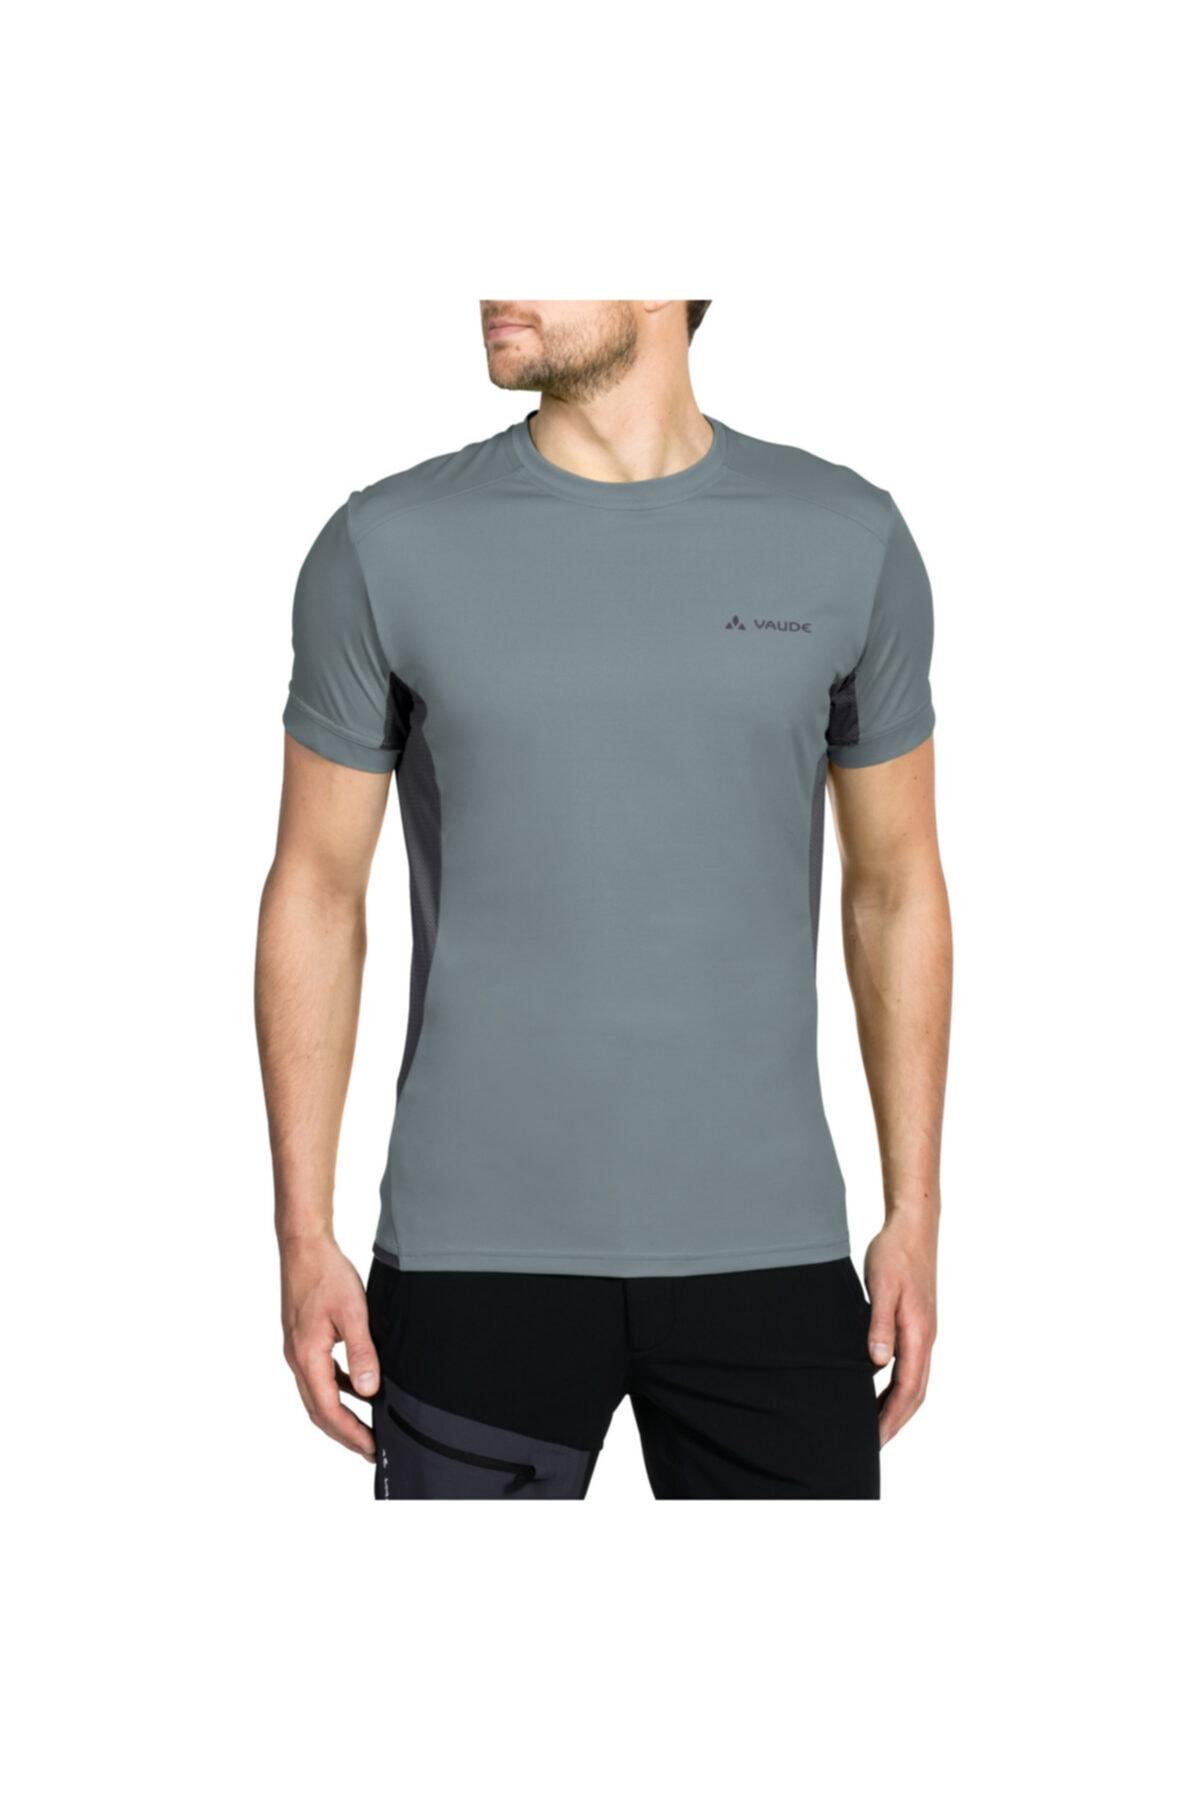 VAUDE Scopi Erkek T-shirt 40423 2